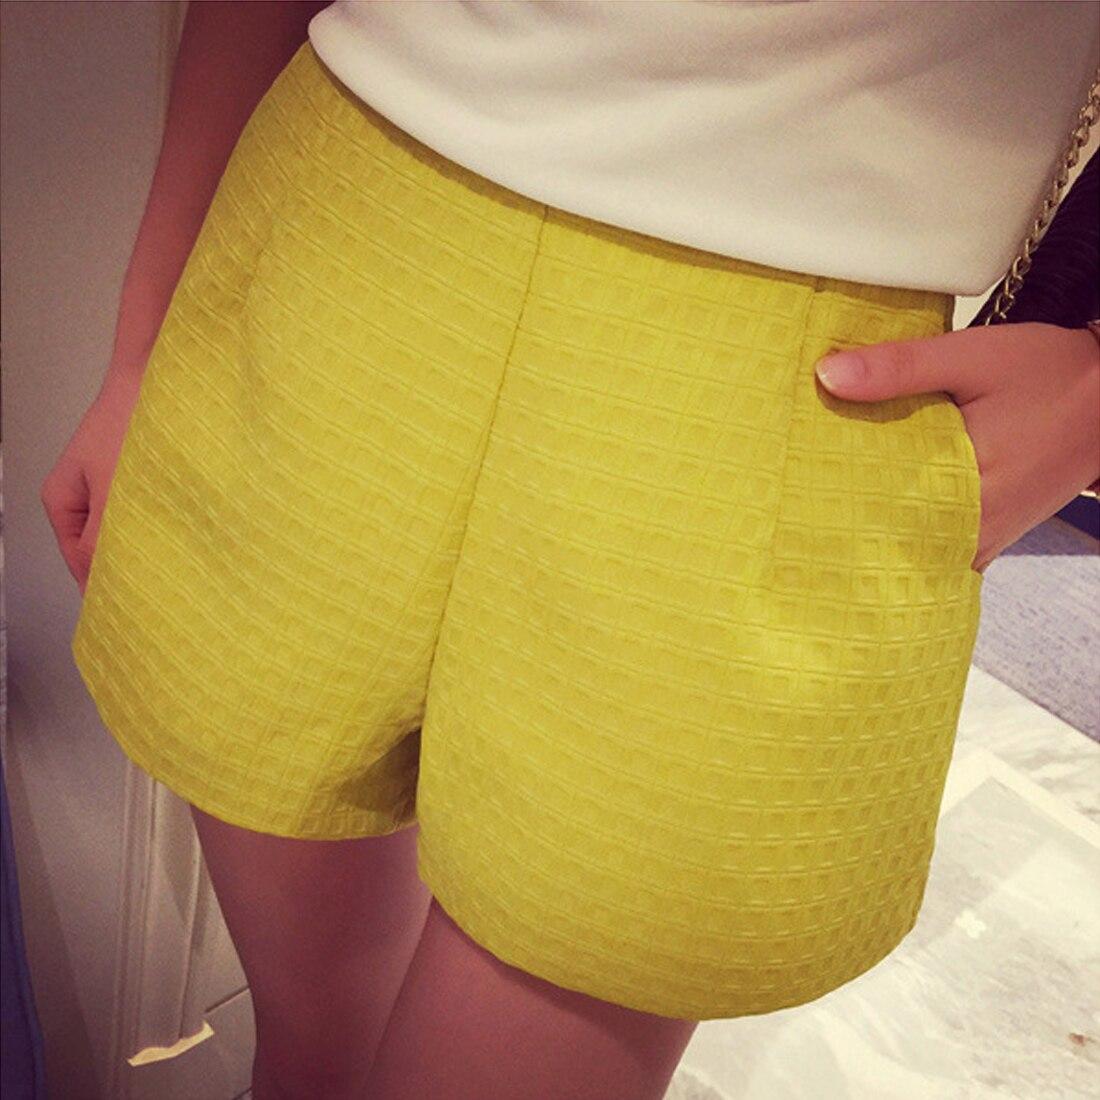 Hot 2017 New Fashion dark Plaid shorts high-waisted shorts Korean Casual women Jeans Shorts crochet shorts Шорты